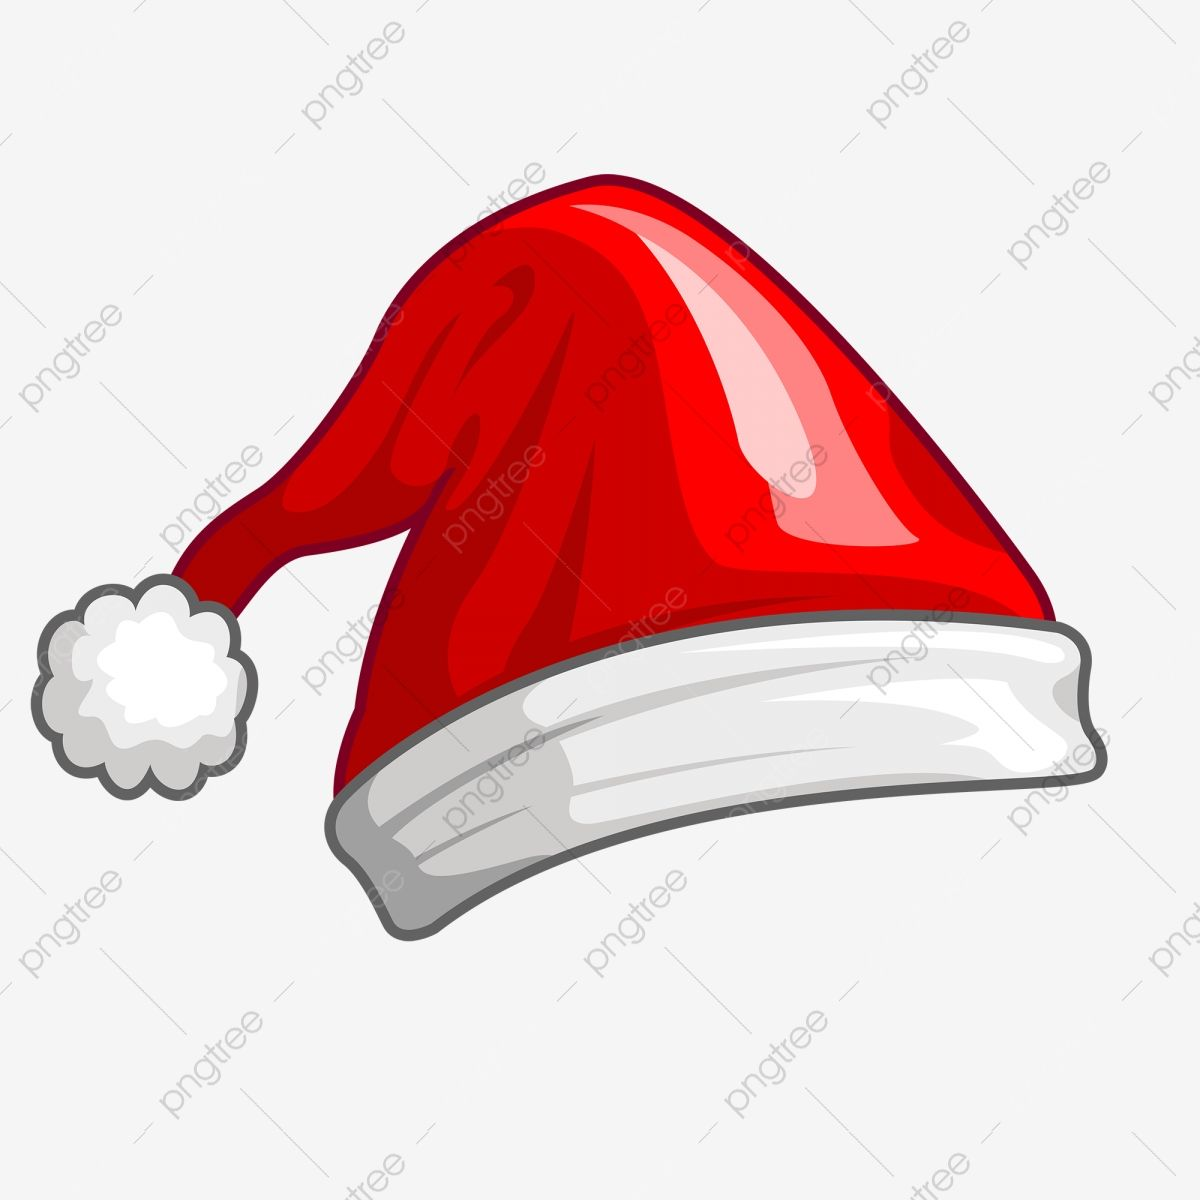 Gorros De Navidad Vector Gorros De Navidad Vector Navidad Santa Claus Png Y Psd Para Descargar Gratis Pngtree Christmas Hat Noel Christmas